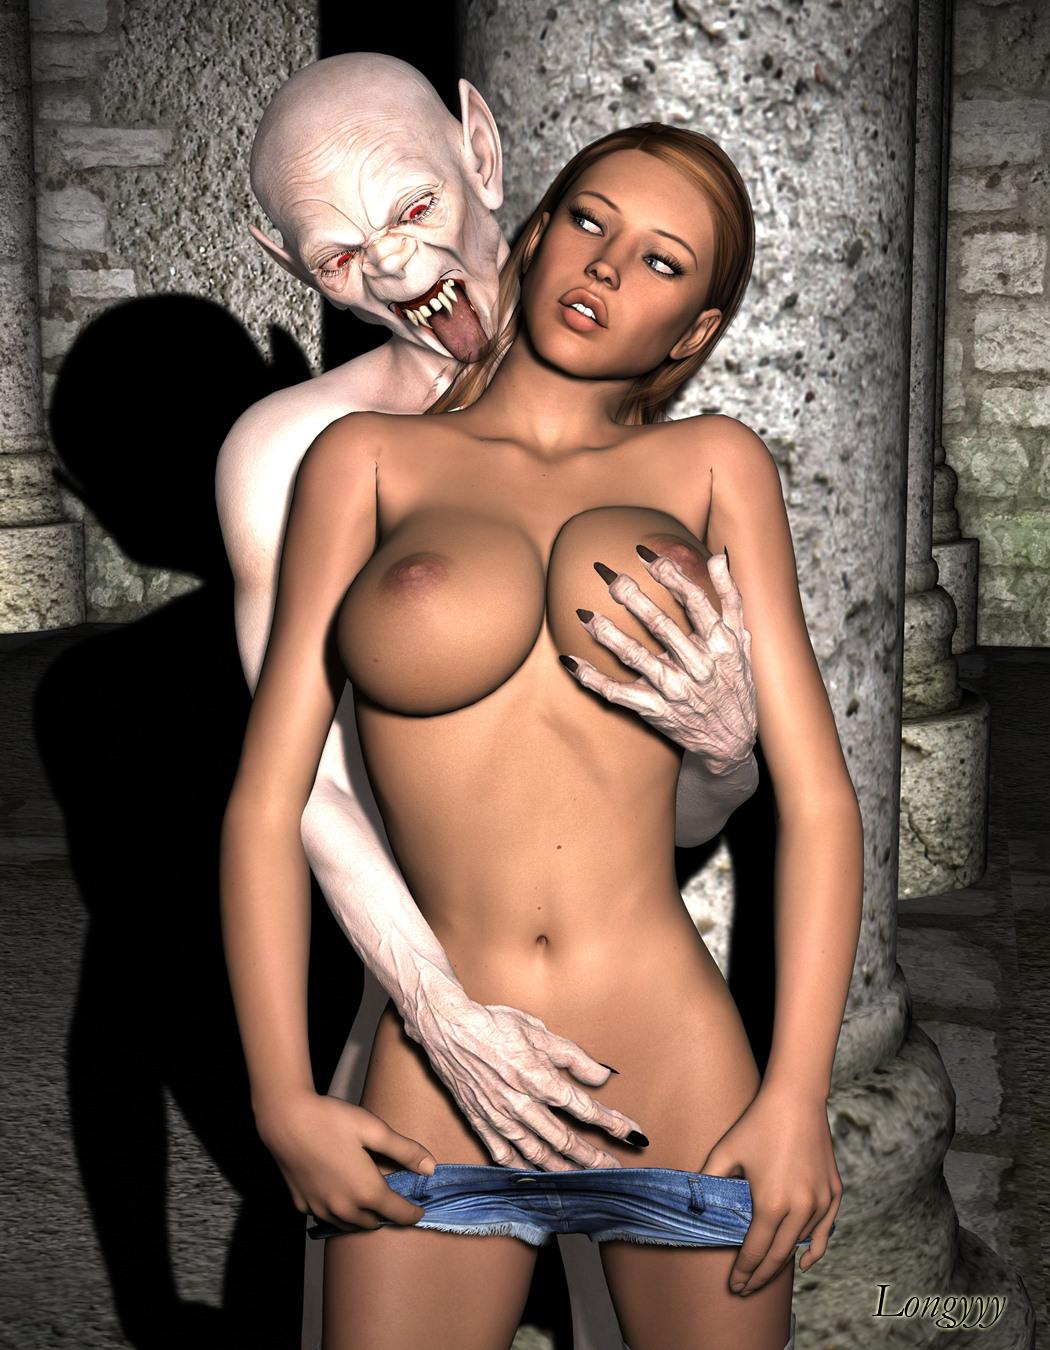 3D Extreme Porn 3d free online extreme hardcore adult sex porn movies videos